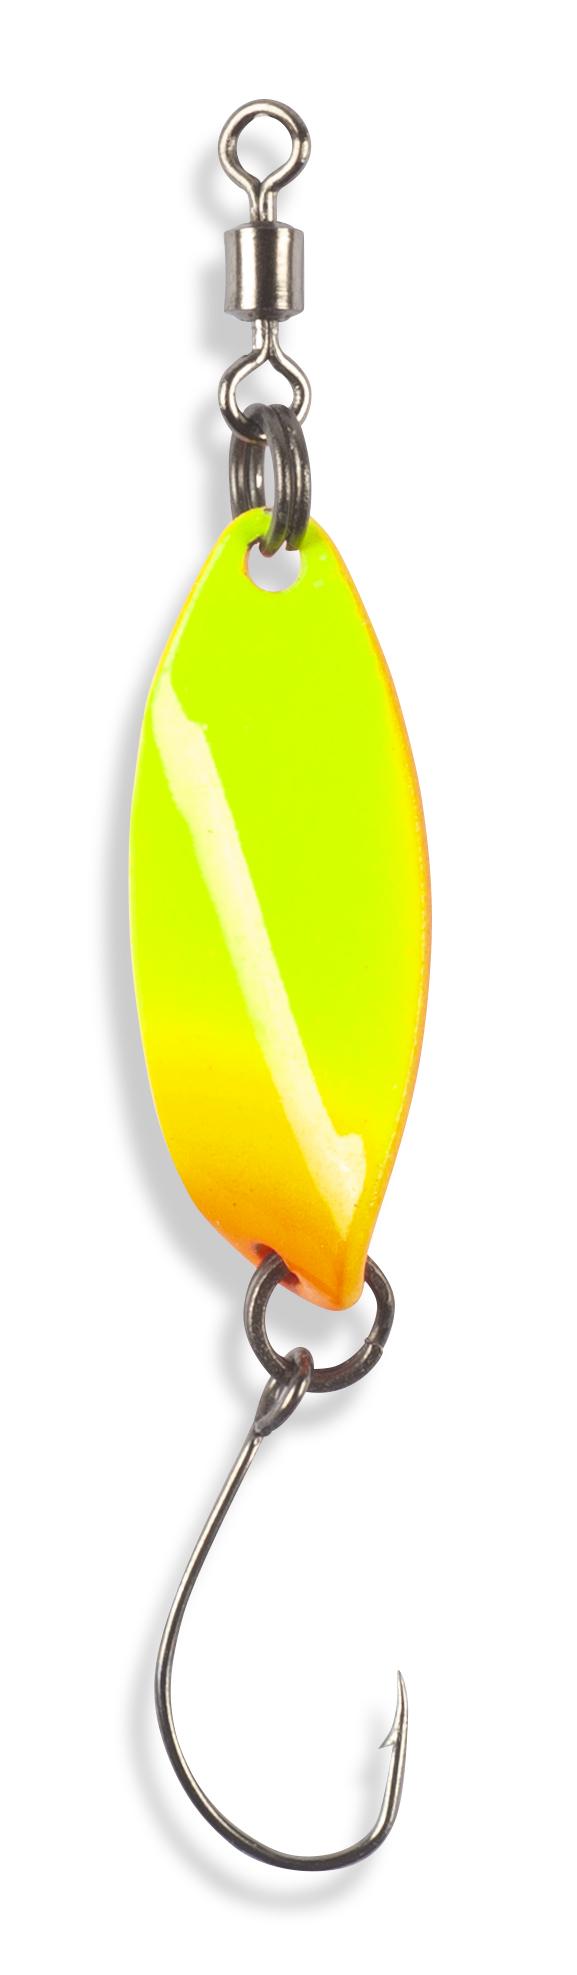 Třpytka Iron Trout Turbine Spoon Barva YOO